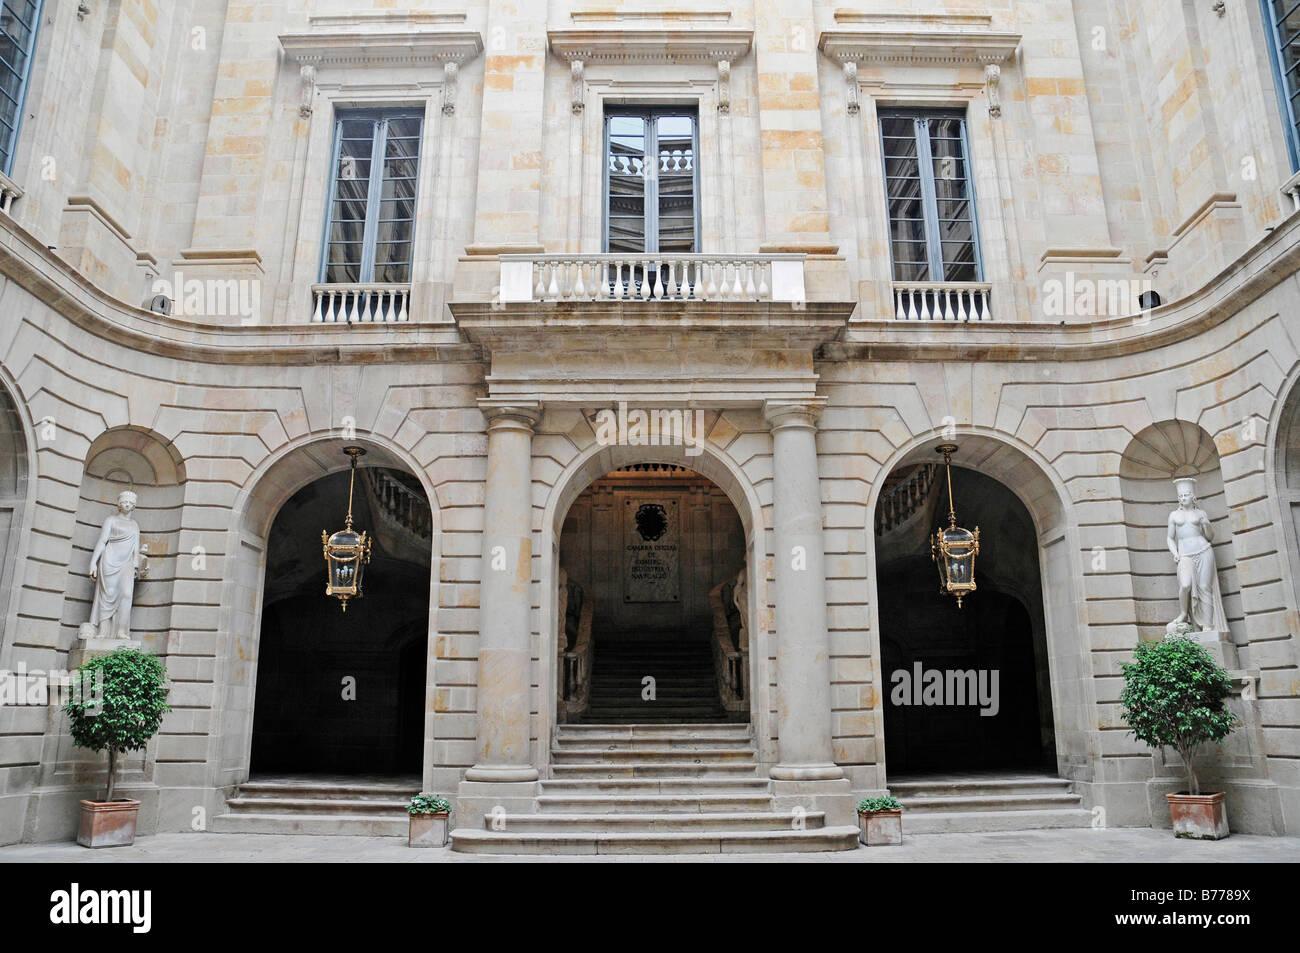 Inner courtyard, Palacio de la Llotja de Mar, former stock exchange, Barcelona, Catalonia, Spain, Europe Stock Photo